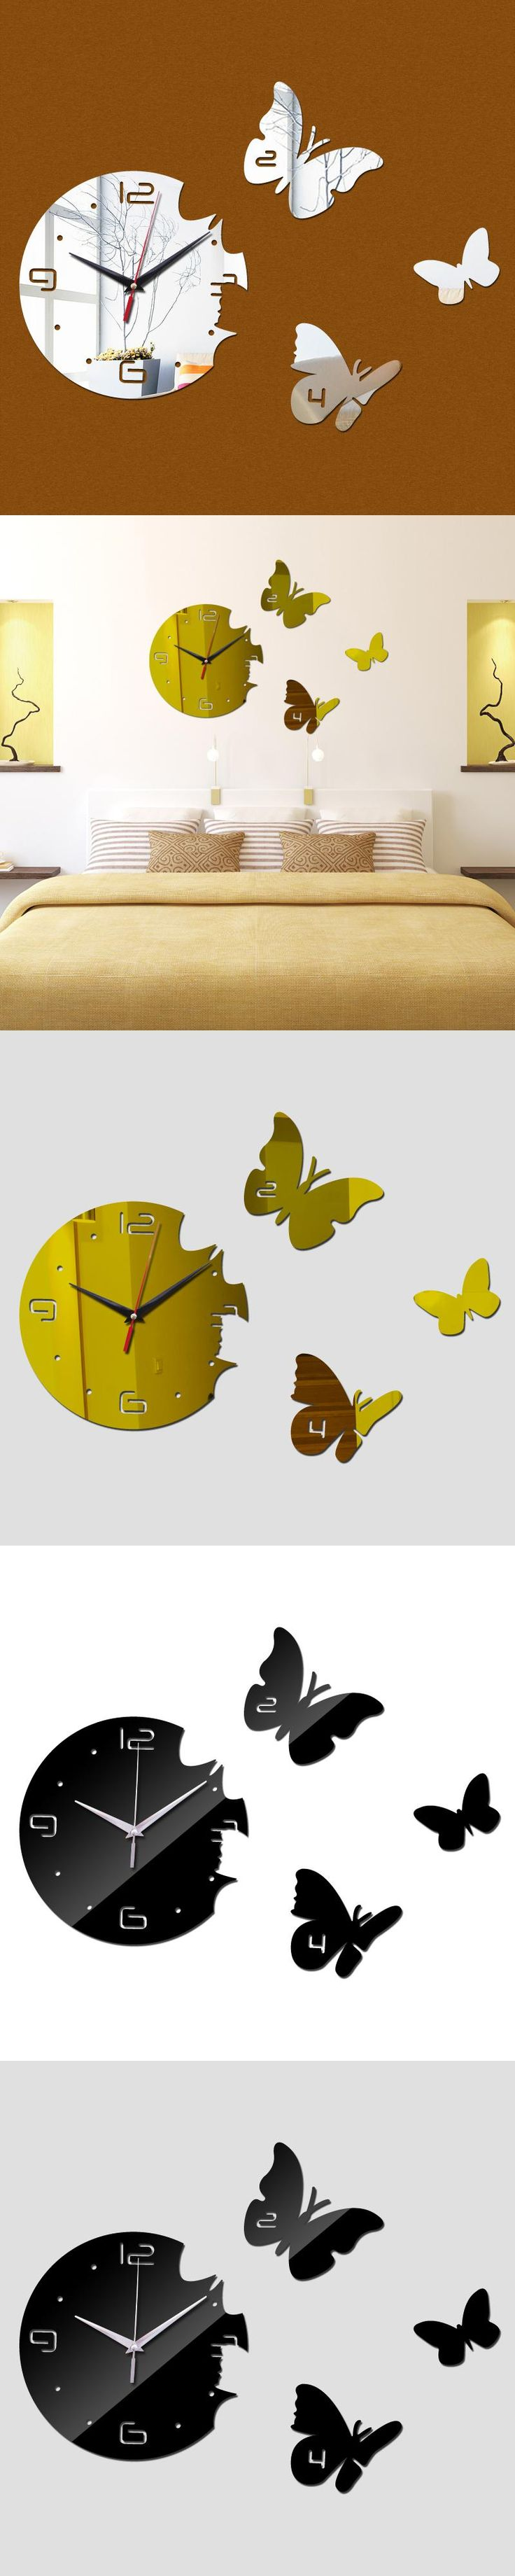 hot sale modern wall clock acrylic mirror clocks quartz need